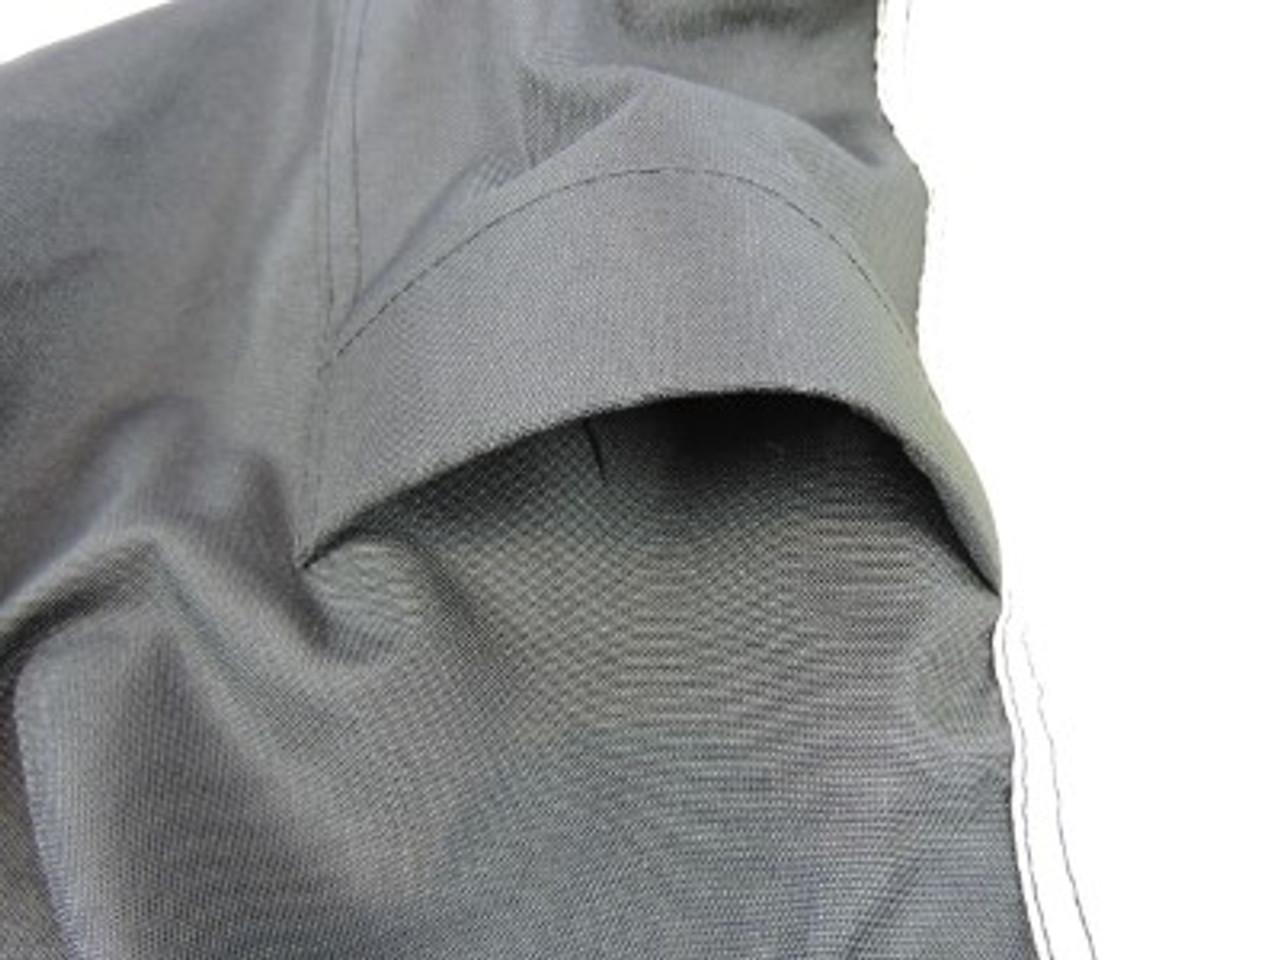 Nannok rear air vents for air circulation and reduced wind lofting